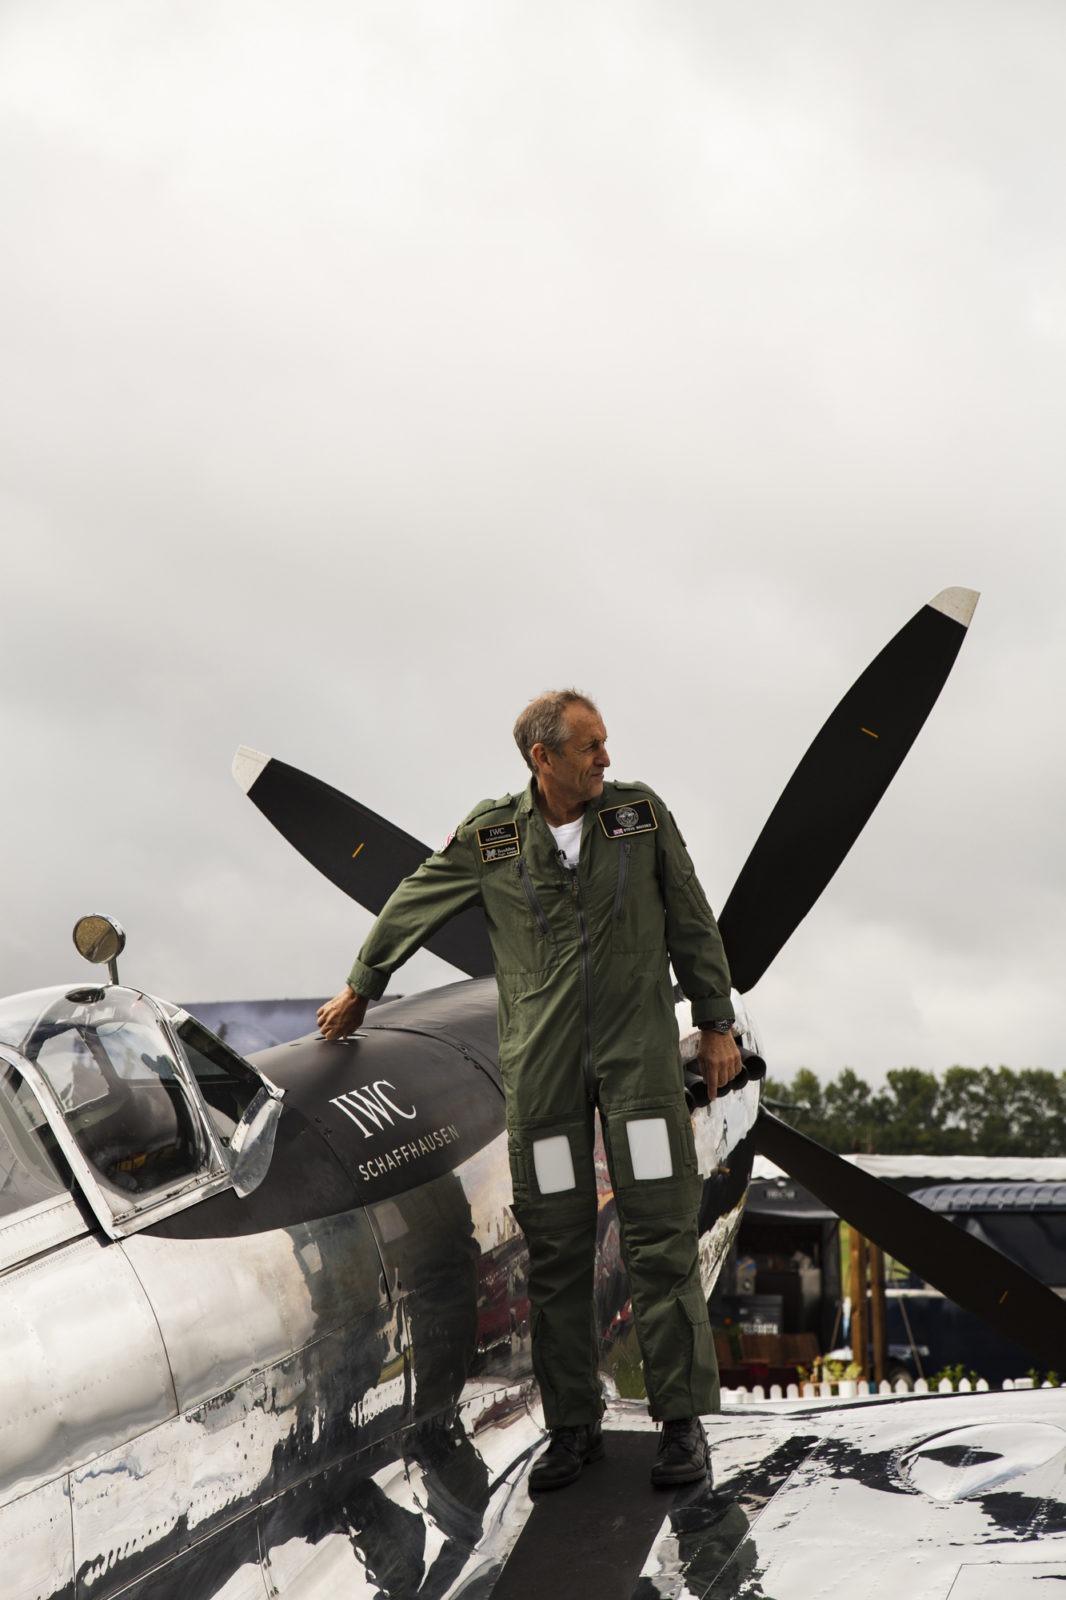 IWC The Longest Flight - Steve Boultbee Brooks